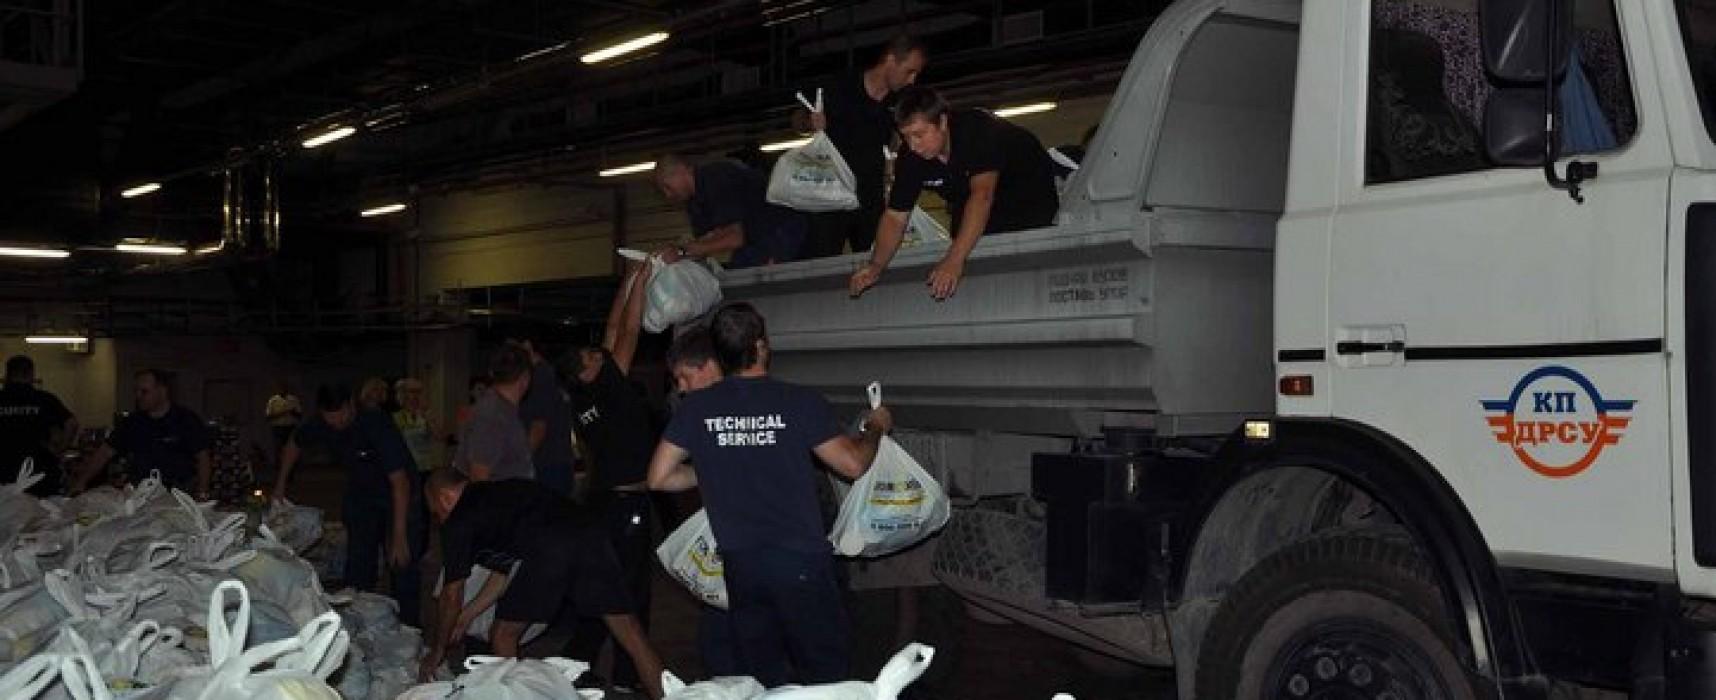 NTV's fake about Humanitarian aid on Donbas Arena Stadium